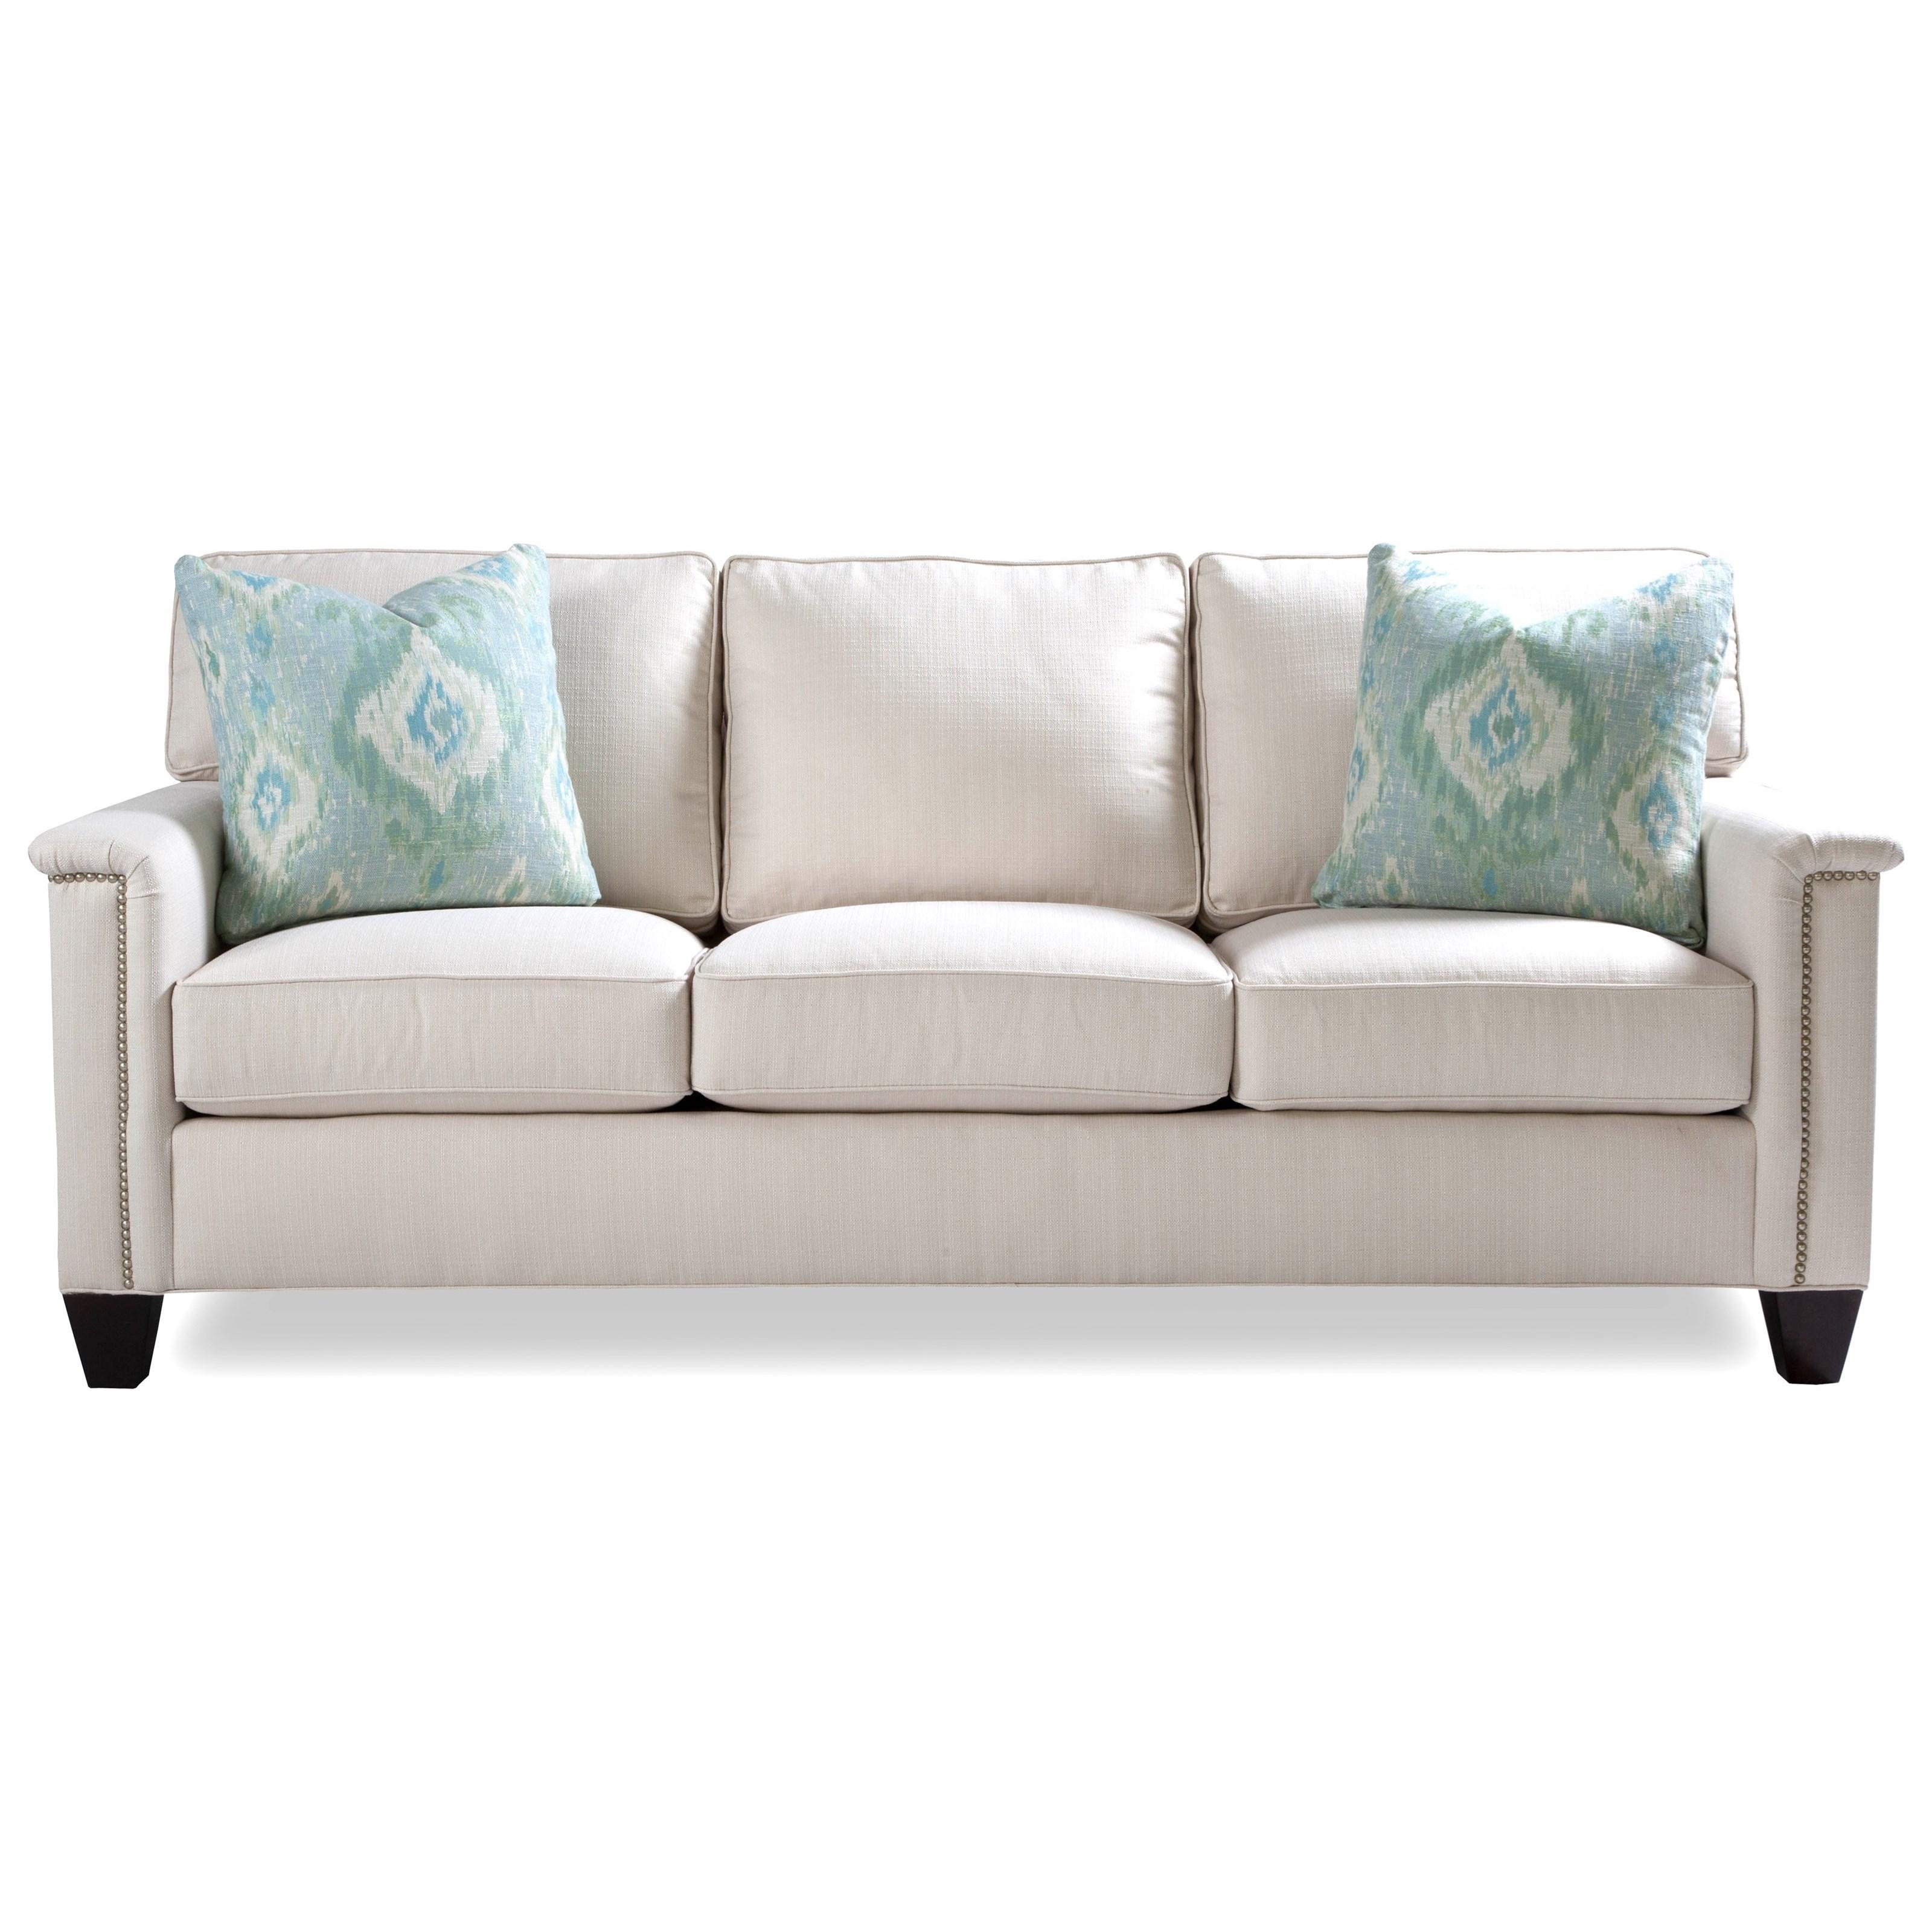 Huntington House BeckettThree Seat Sofa Sleeper ...